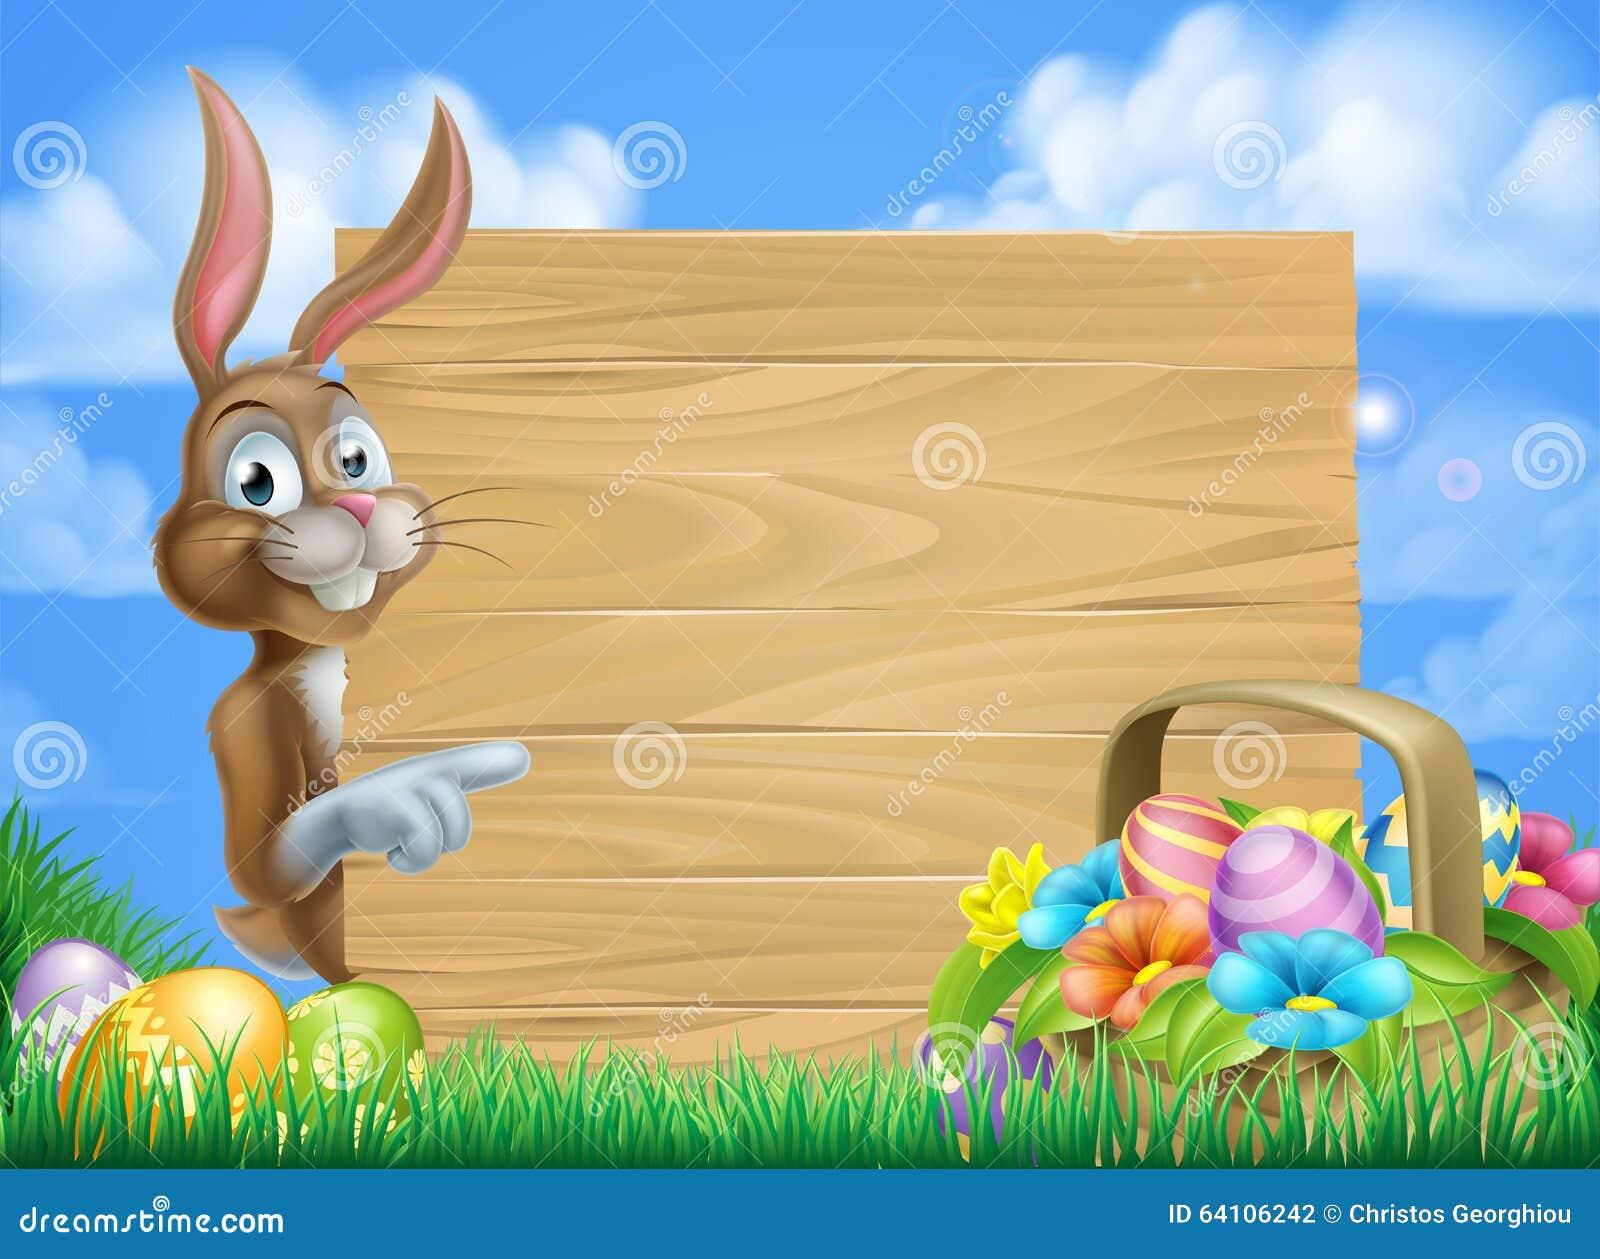 Easter Bunny Sign Background Stock Illustration - Image ...